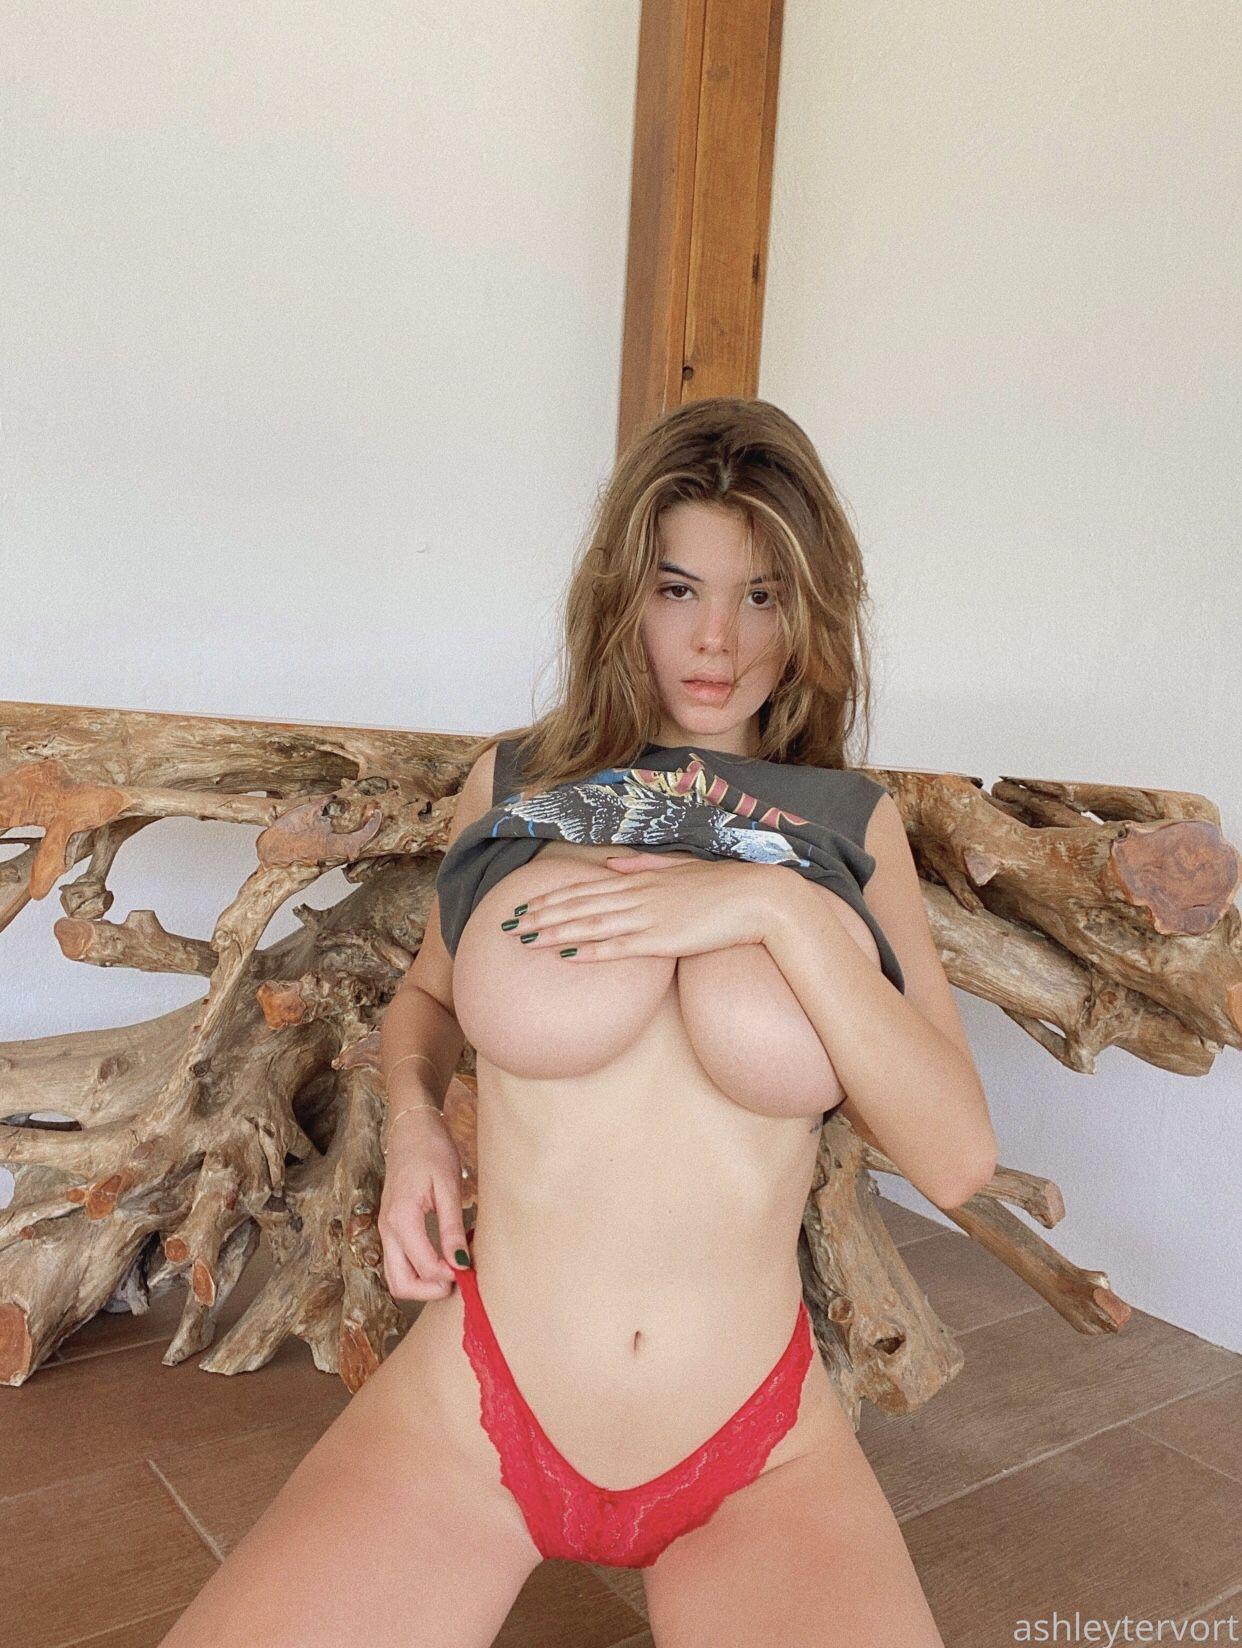 Ashley Tervort Naked